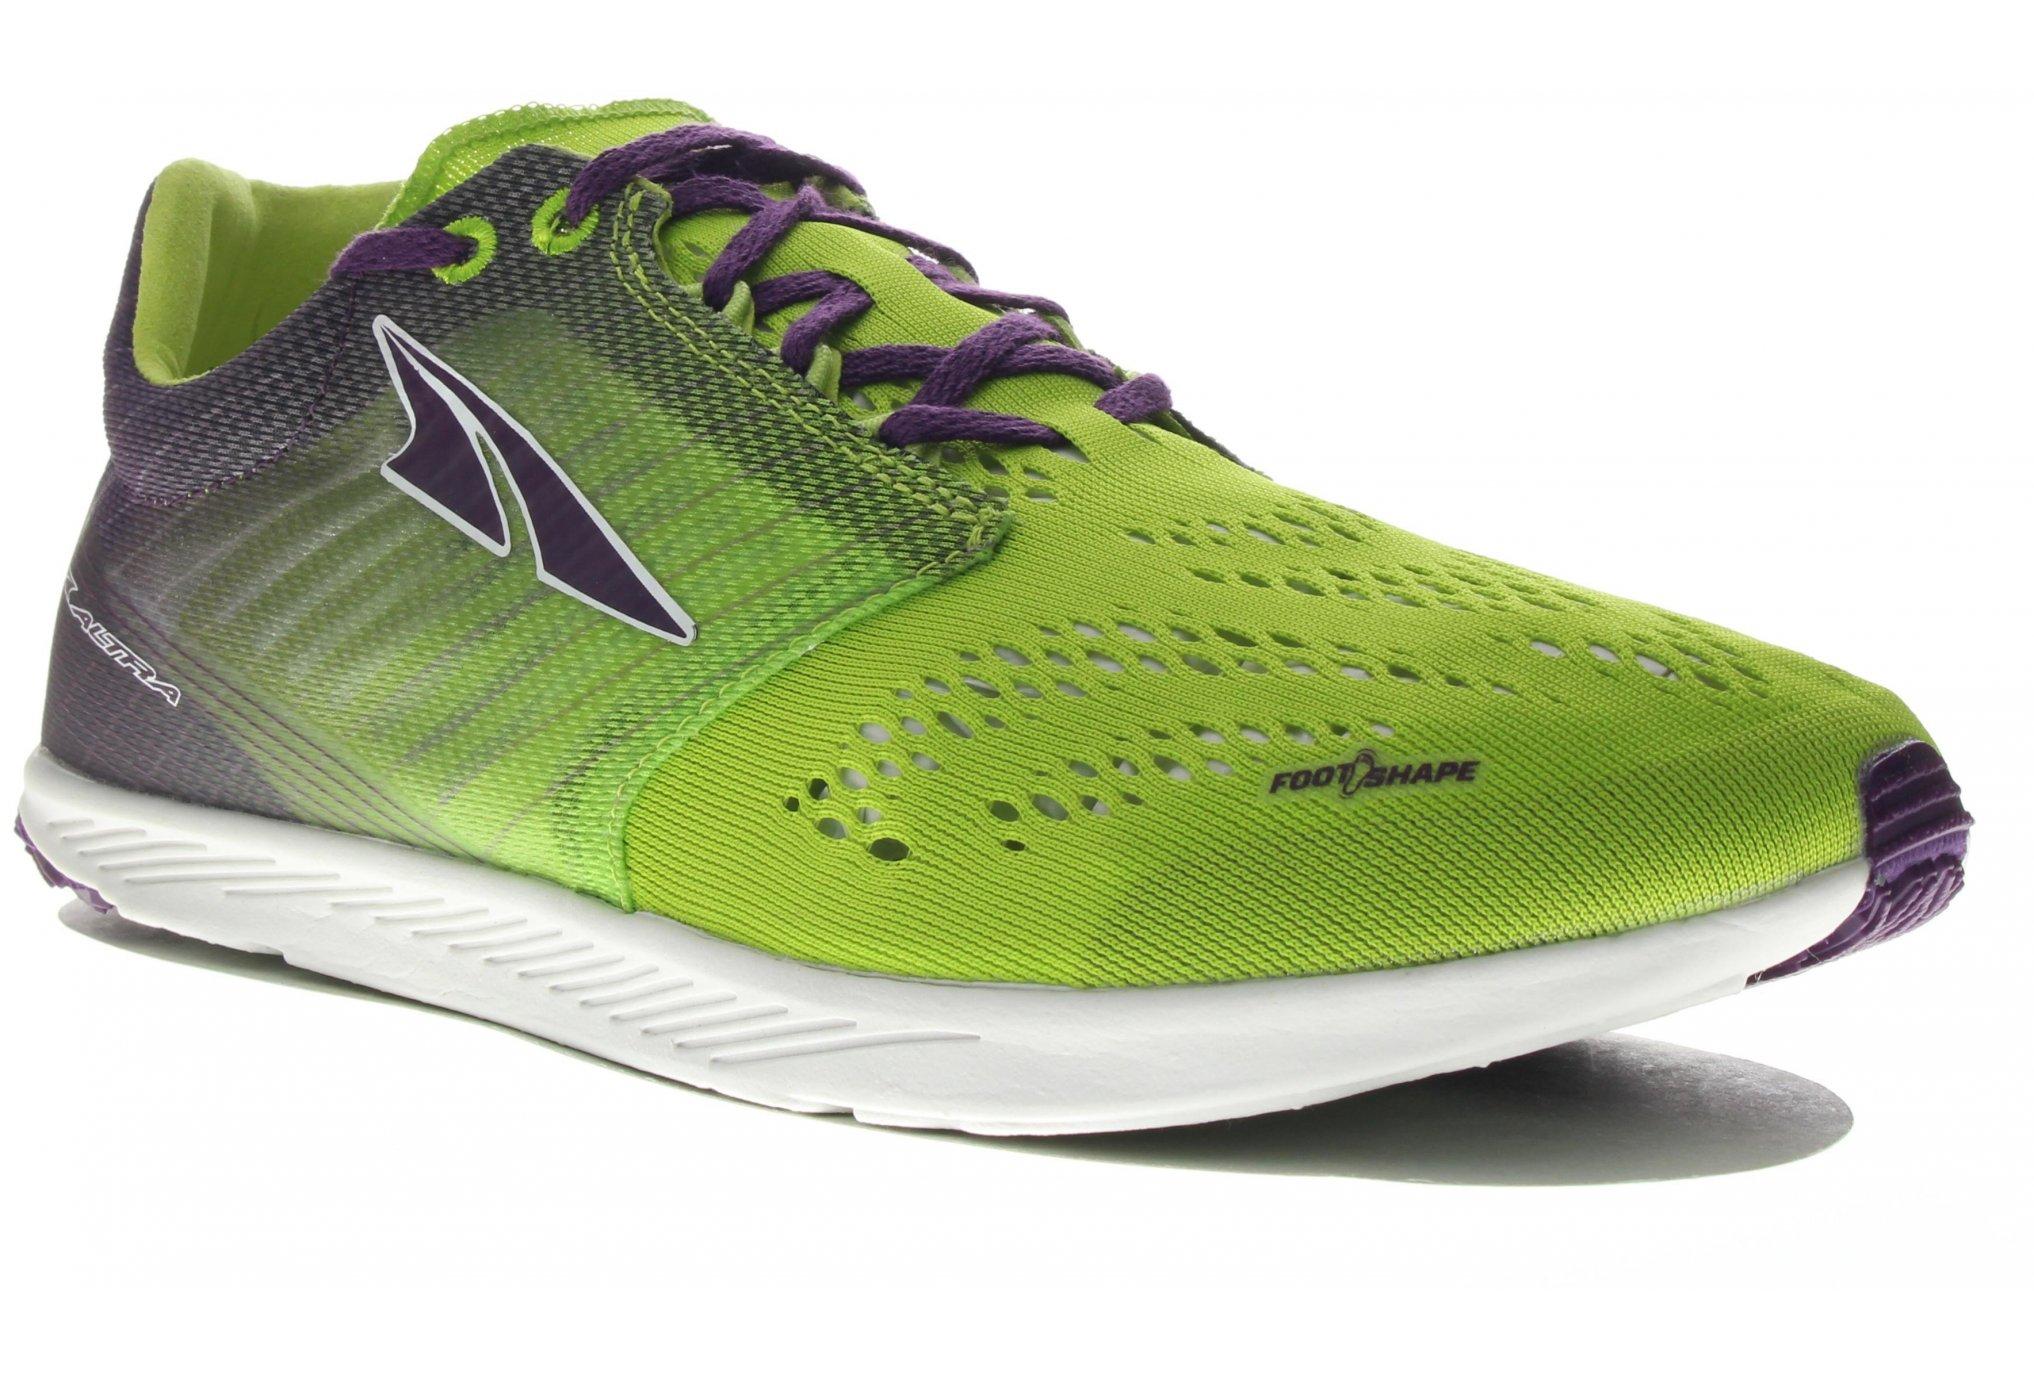 Altra Vanish-R Chaussures homme